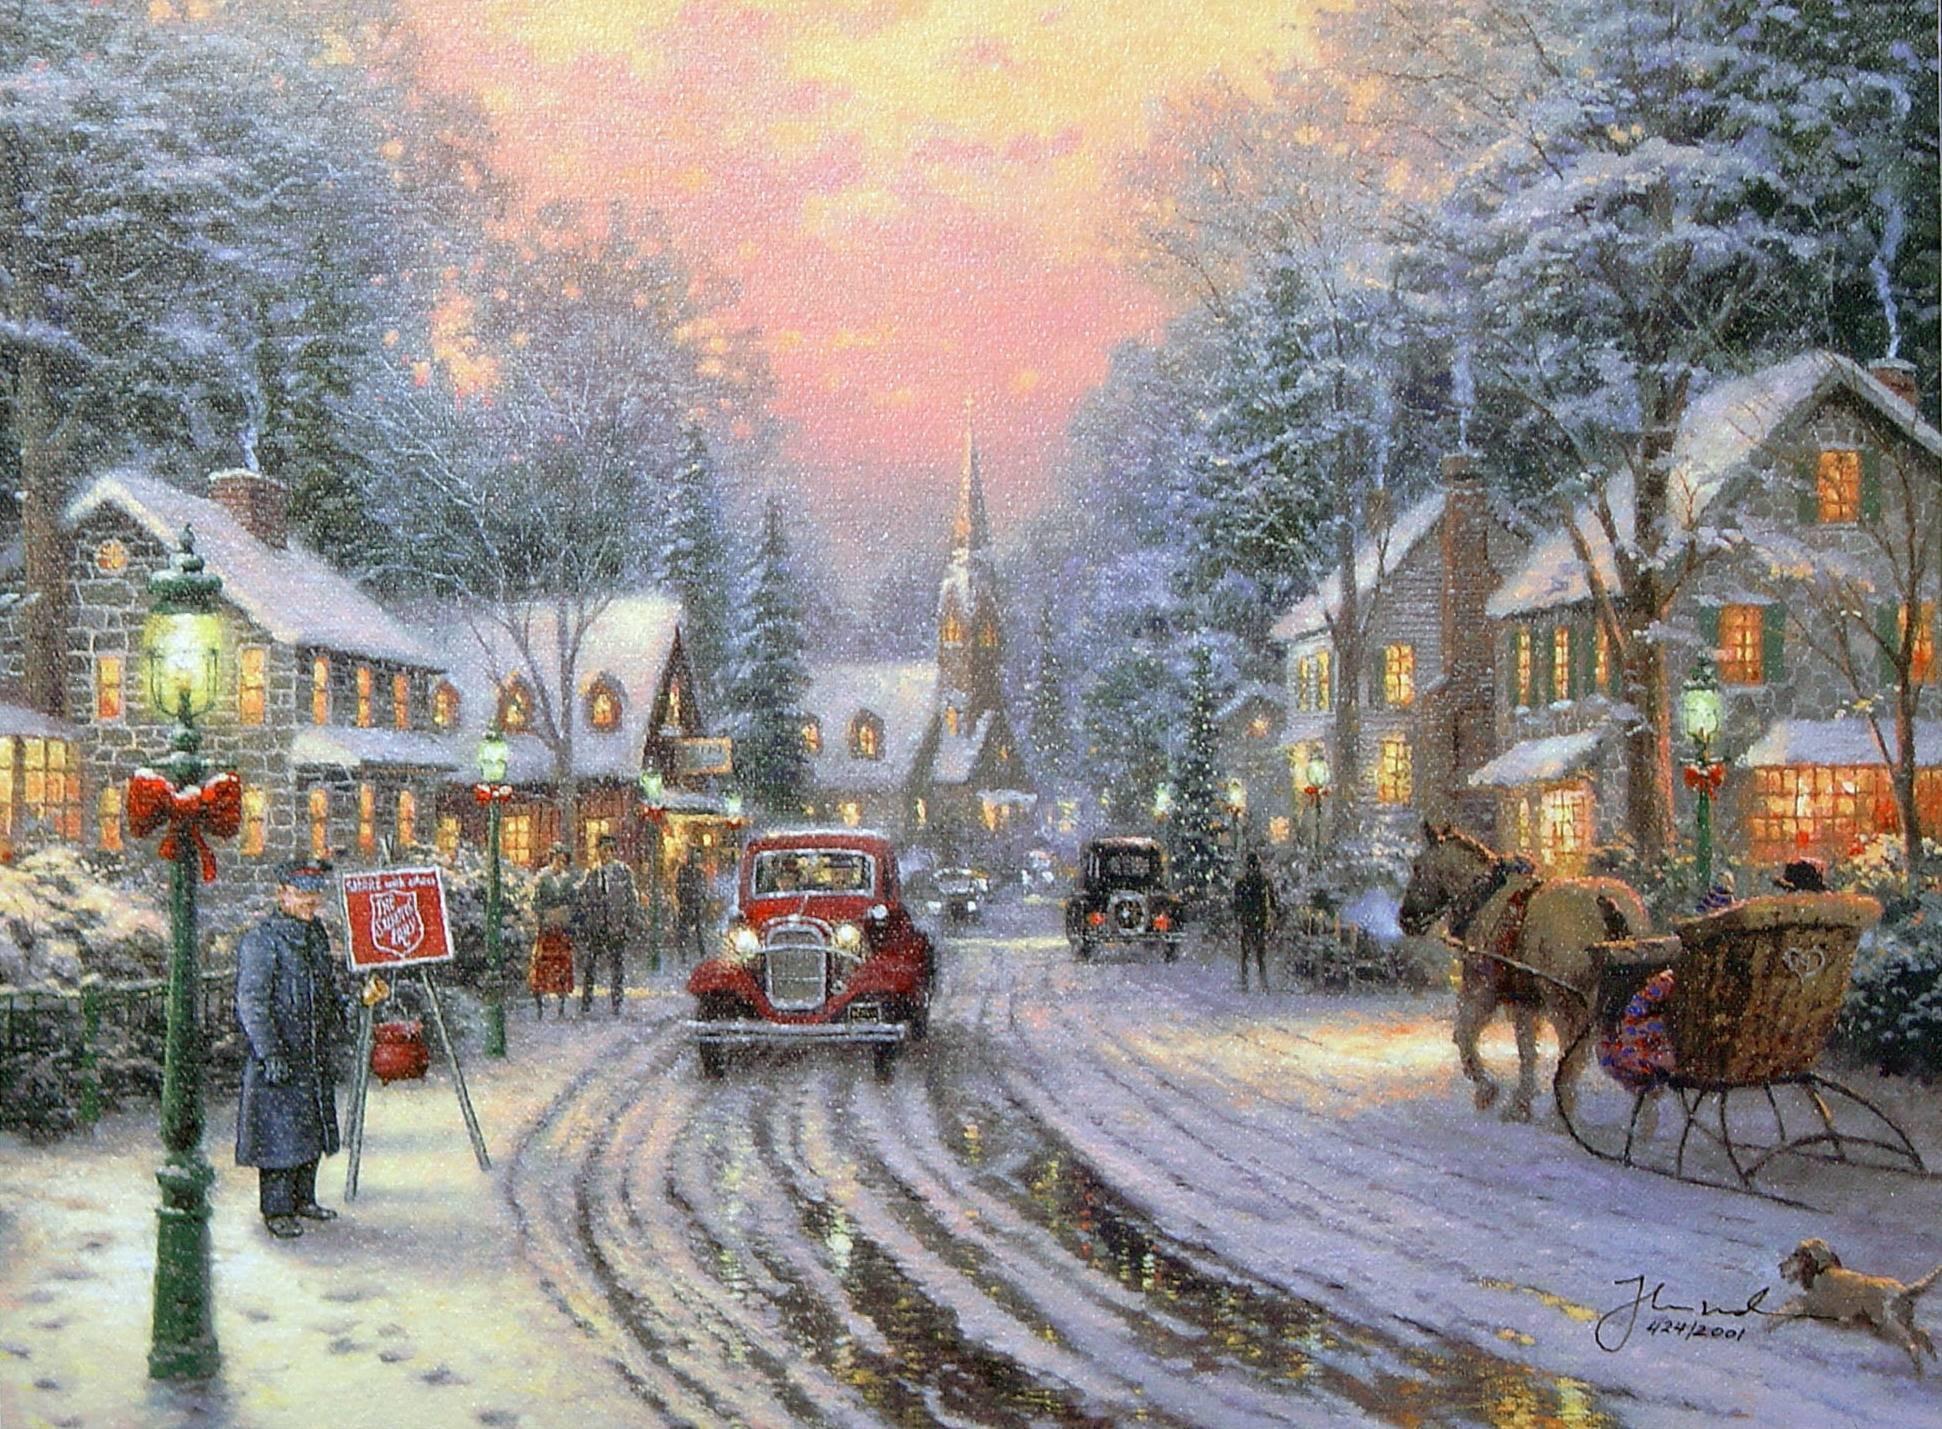 Related Pictures Thomas Kinkade Disney Wallpaper Free Wallpaper .